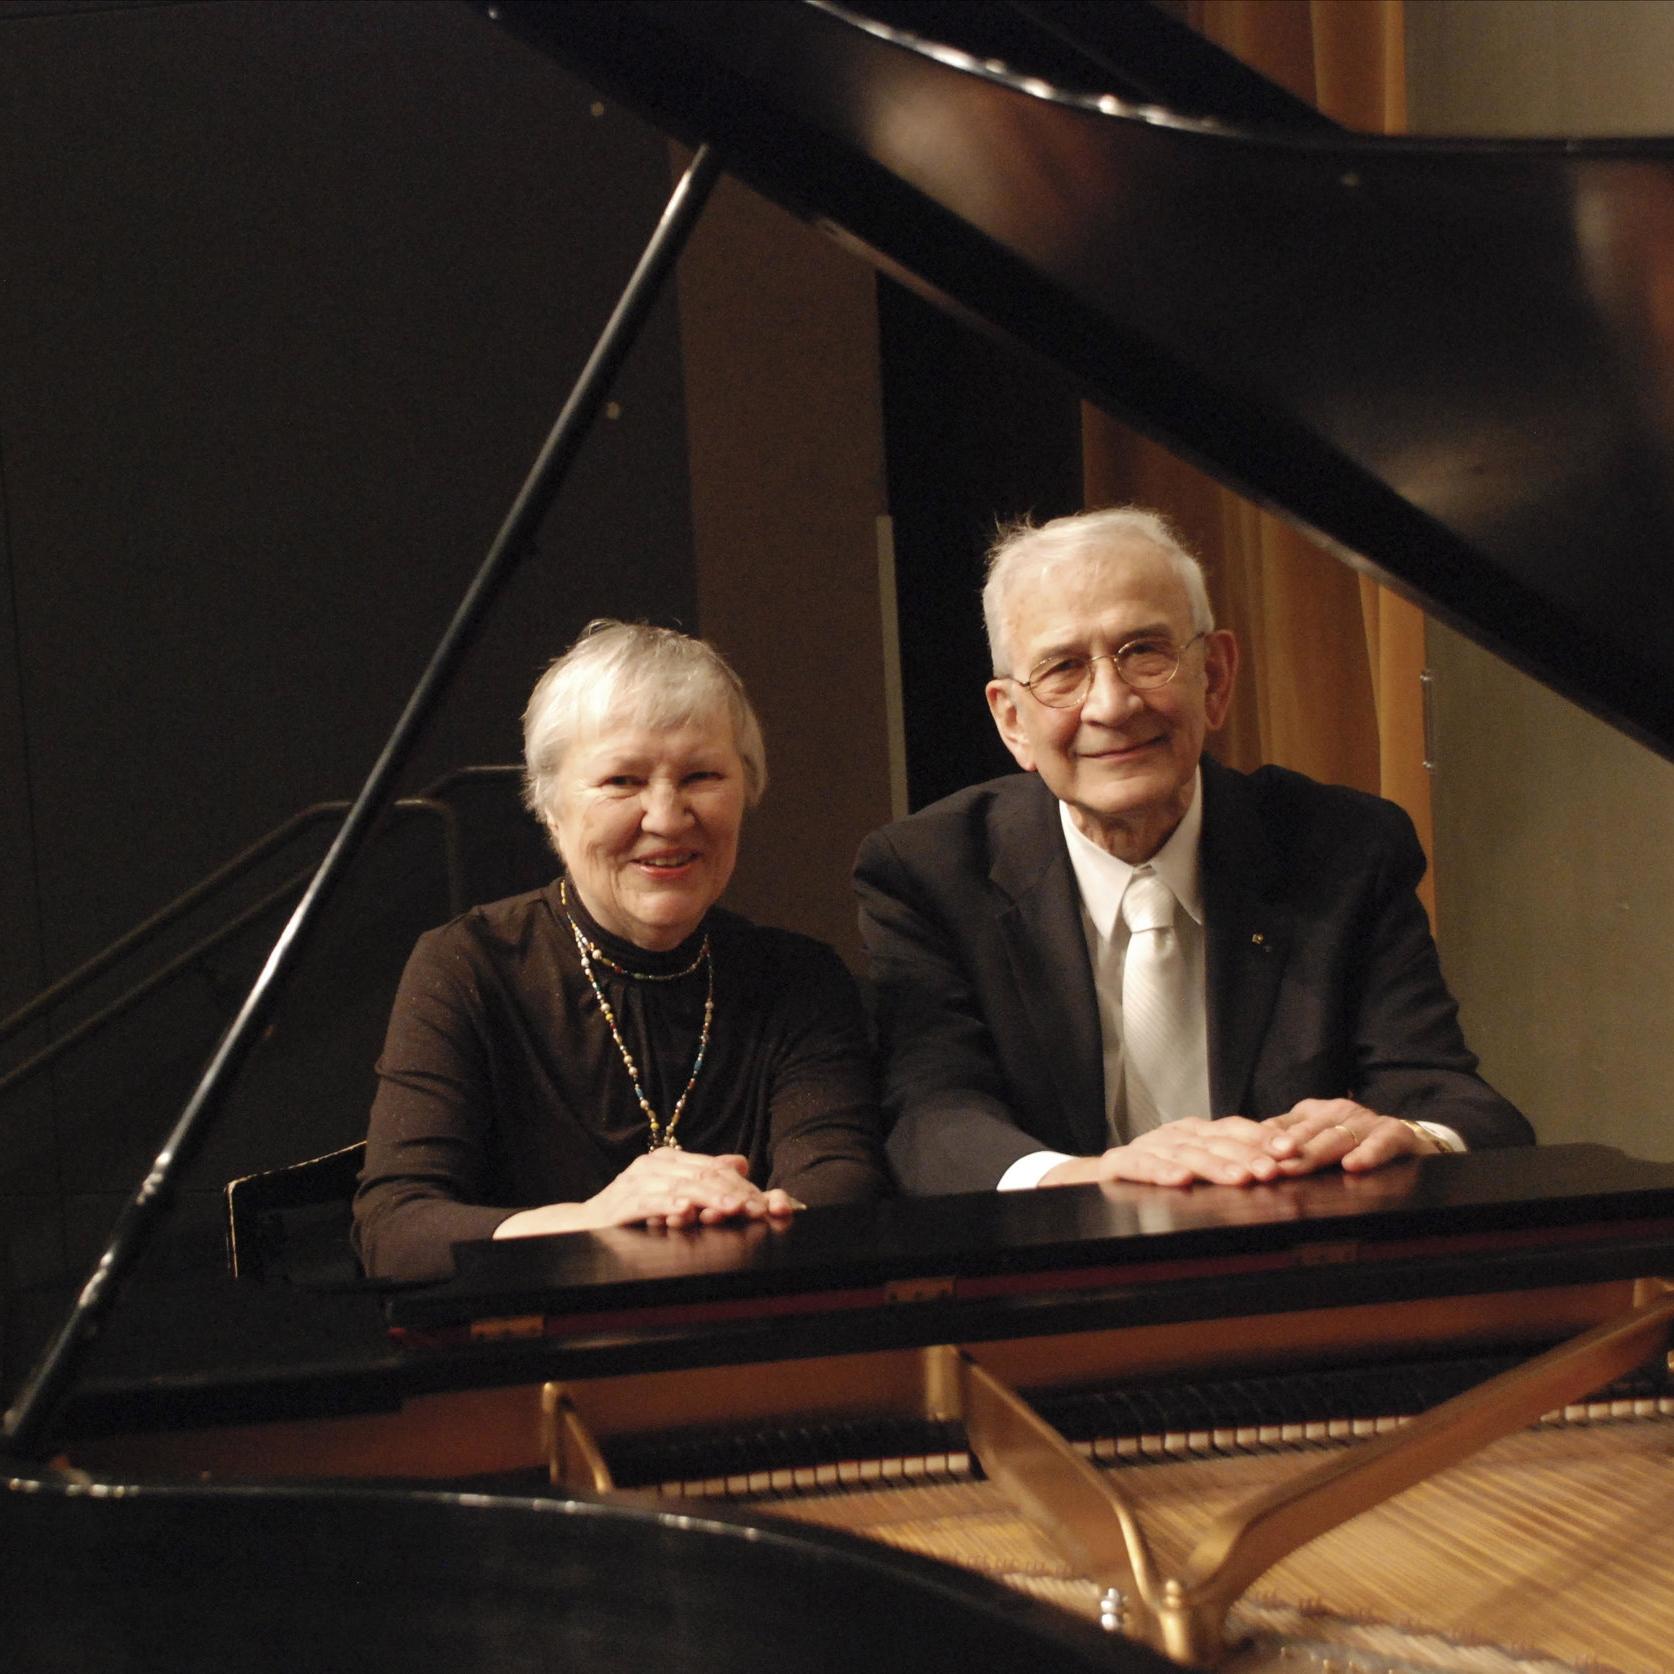 Helen and Paul Baumgartner, piano duo